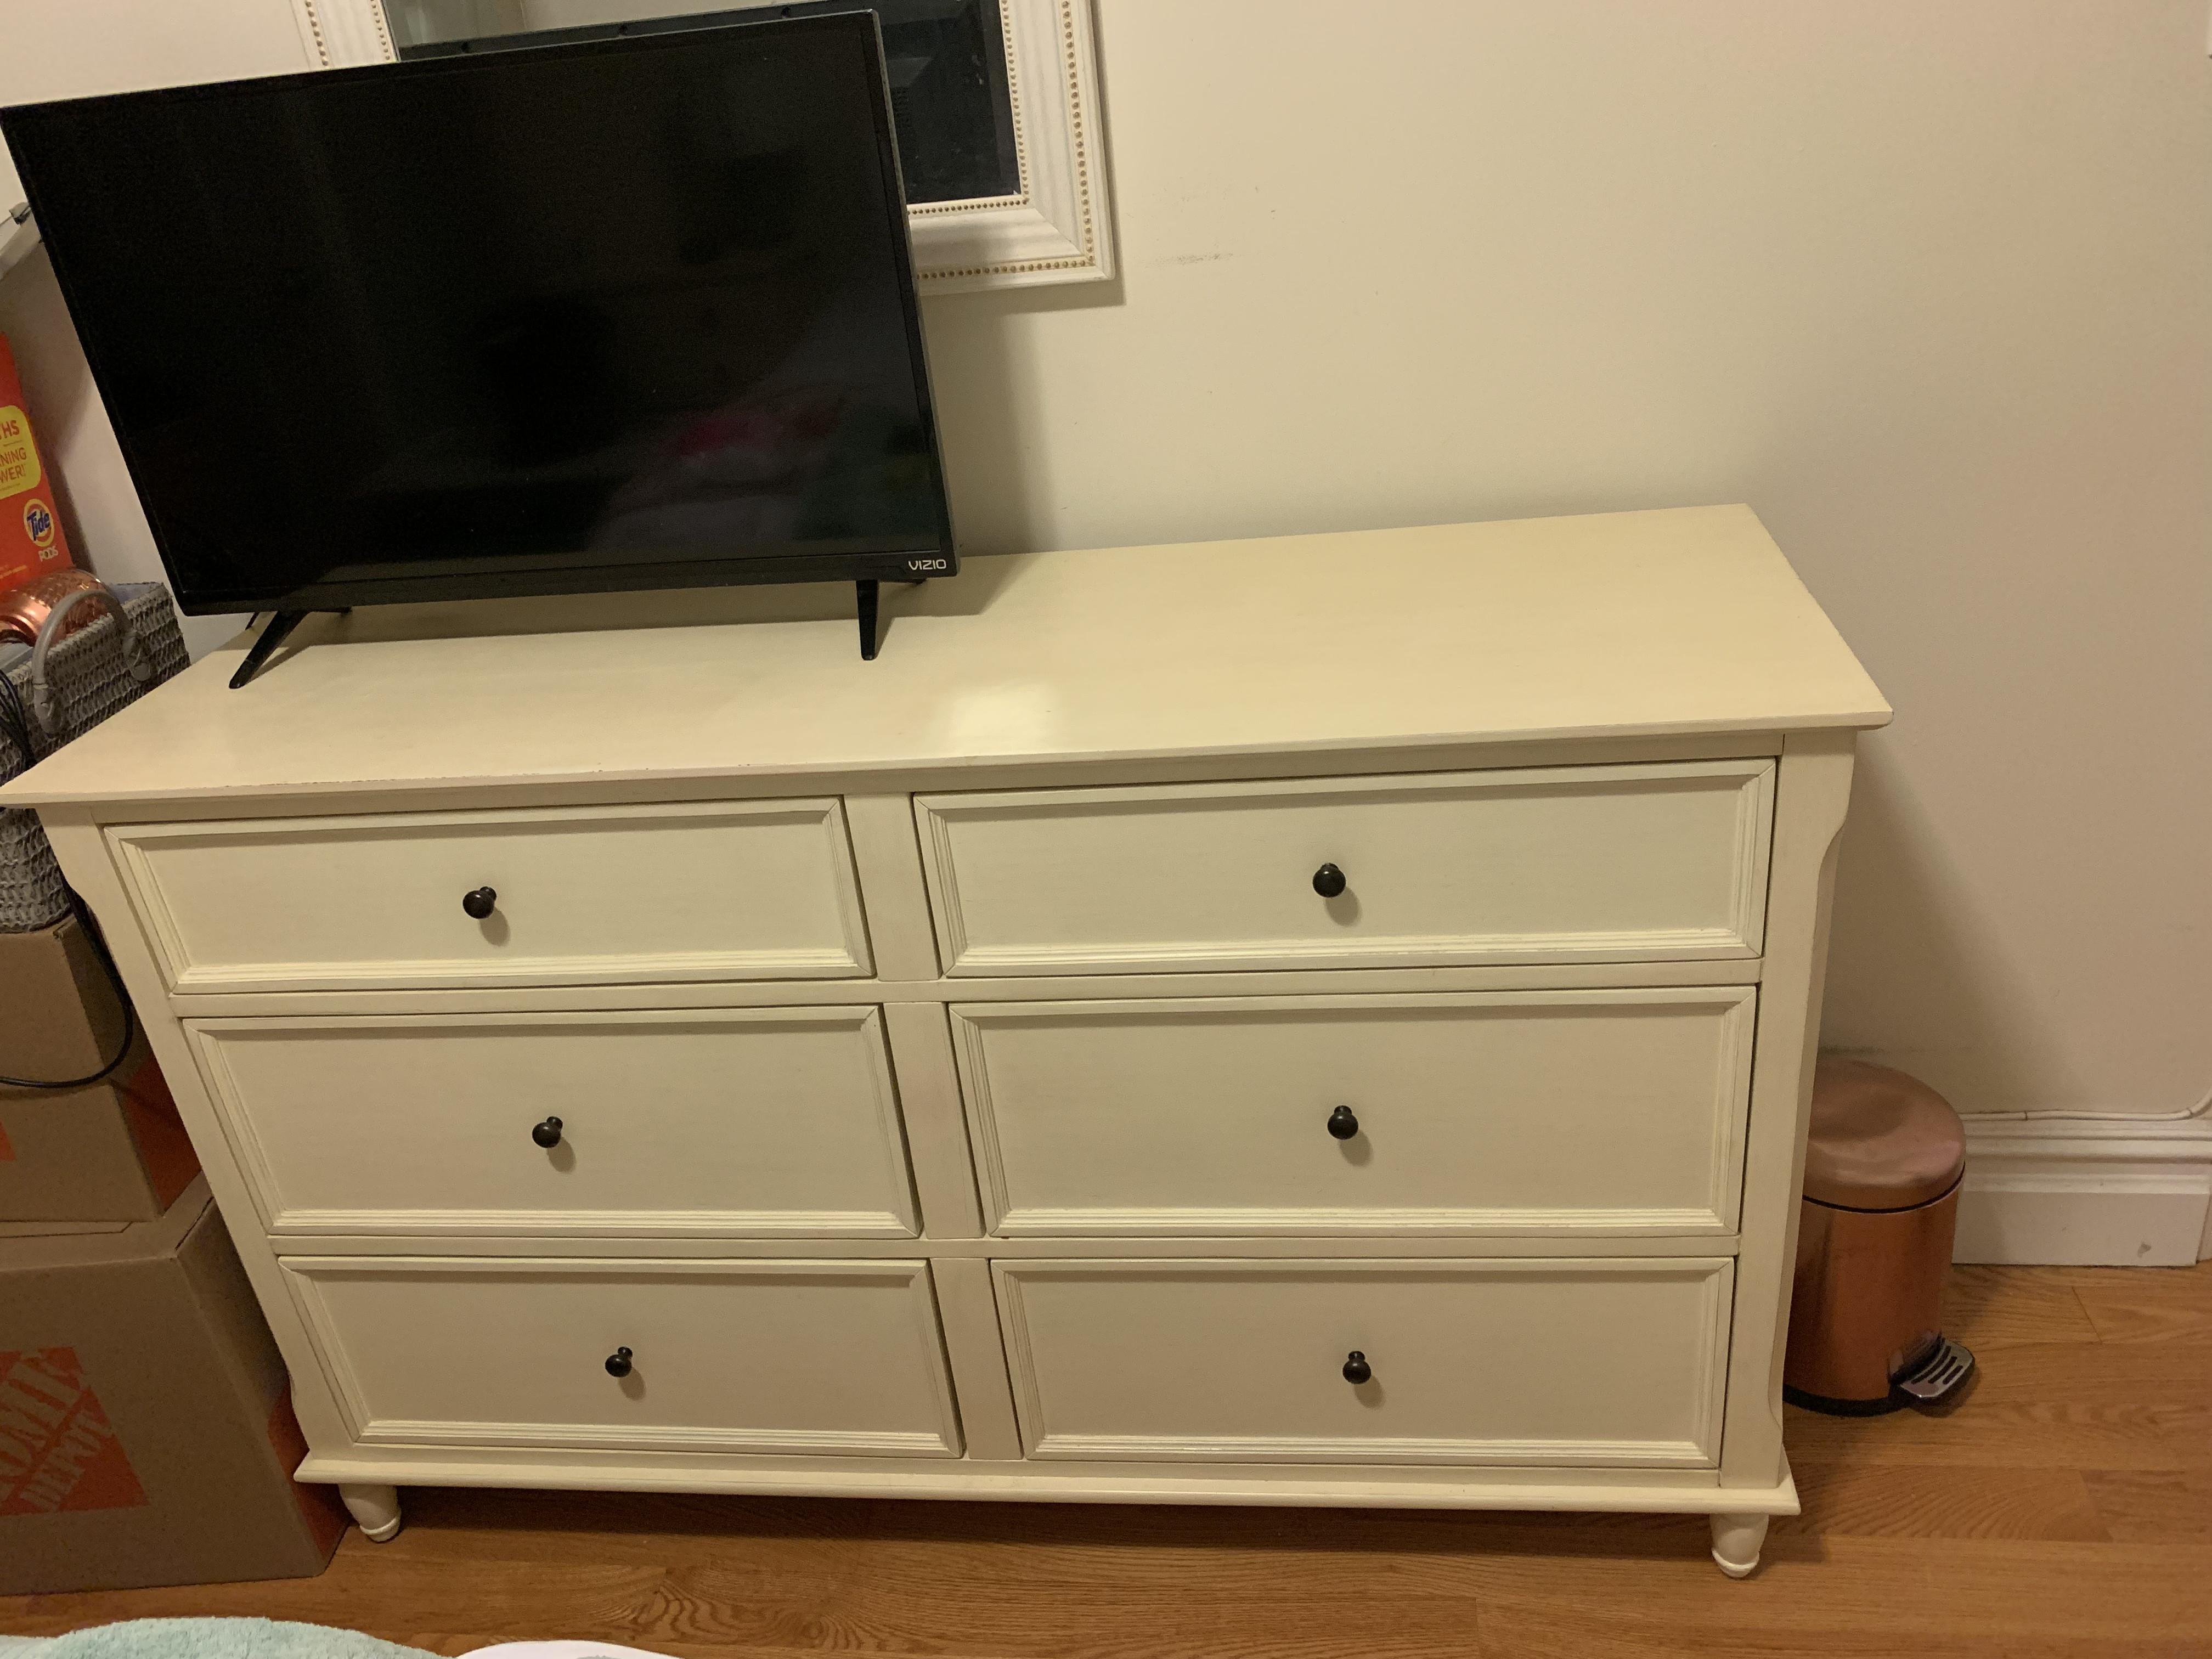 The Furniture Warehouse 6-Drawer Dresser